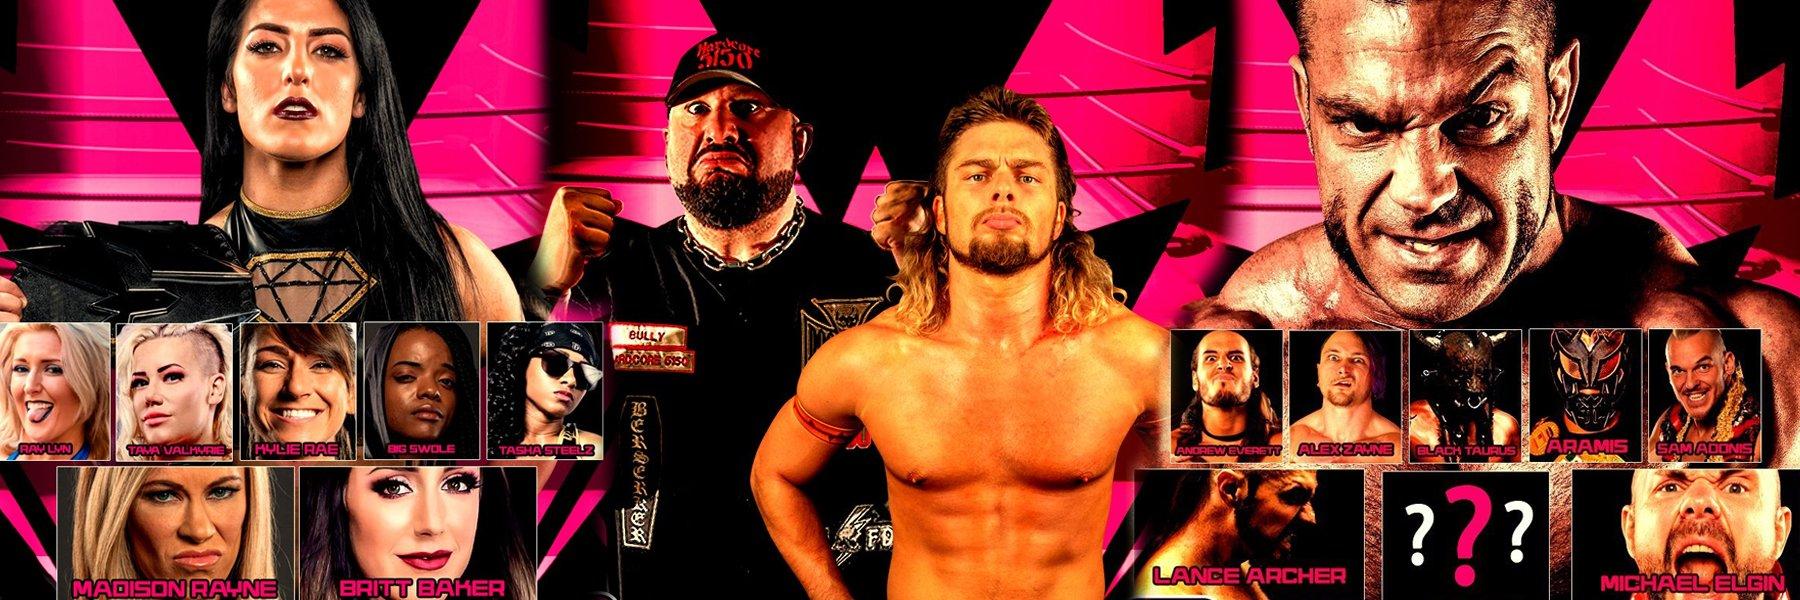 Warrior Wrestling 8: Tessa Blanchard, Big Swole, Taya Valkyrie, Kylie Rae